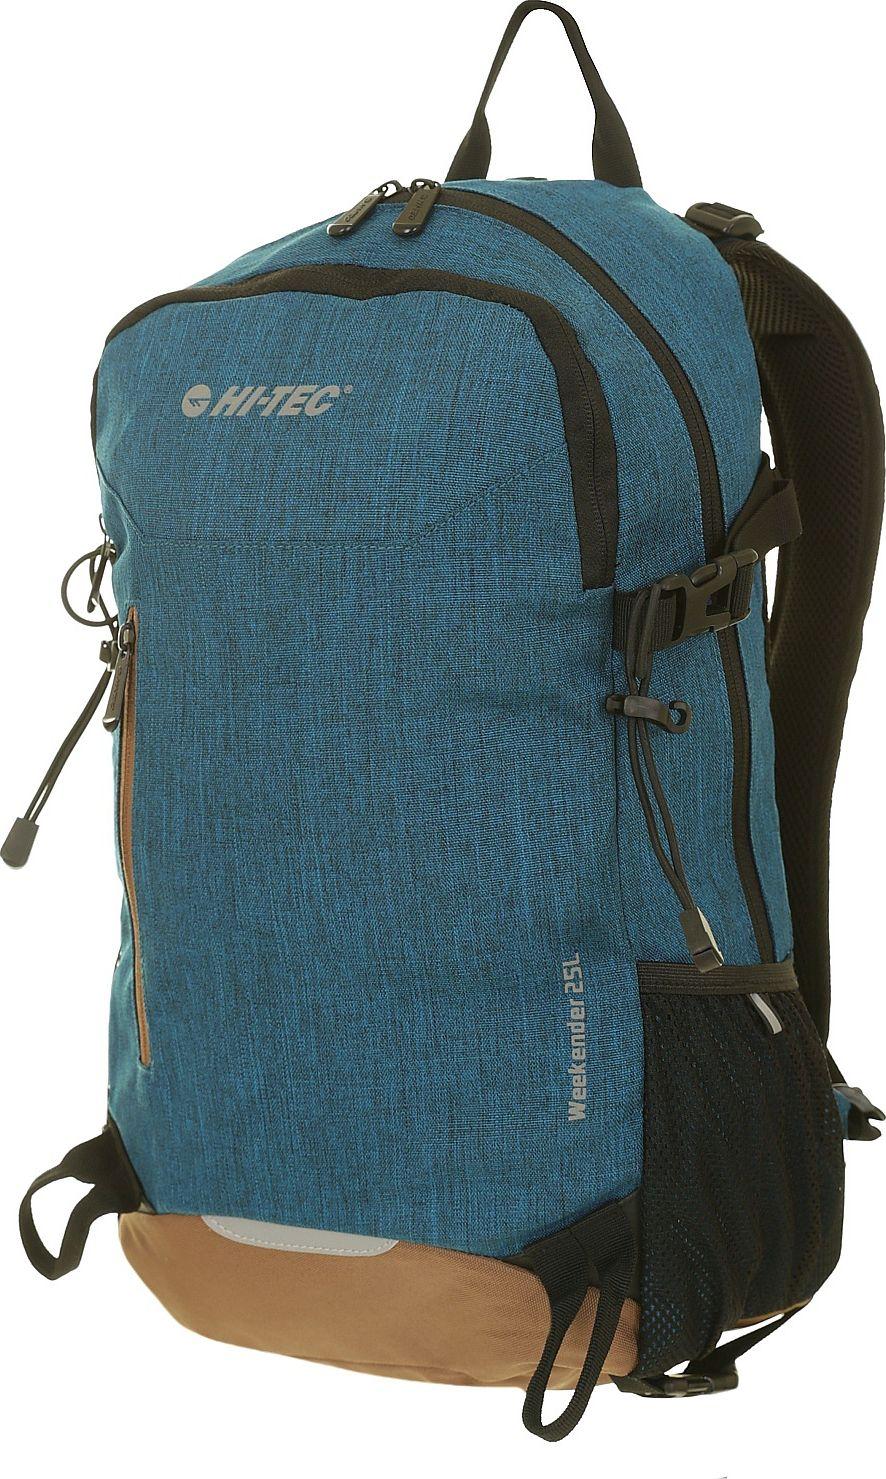 Hi-tec Backpack Weekender 25l Blue Melange / Brown Tūrisma Mugursomas